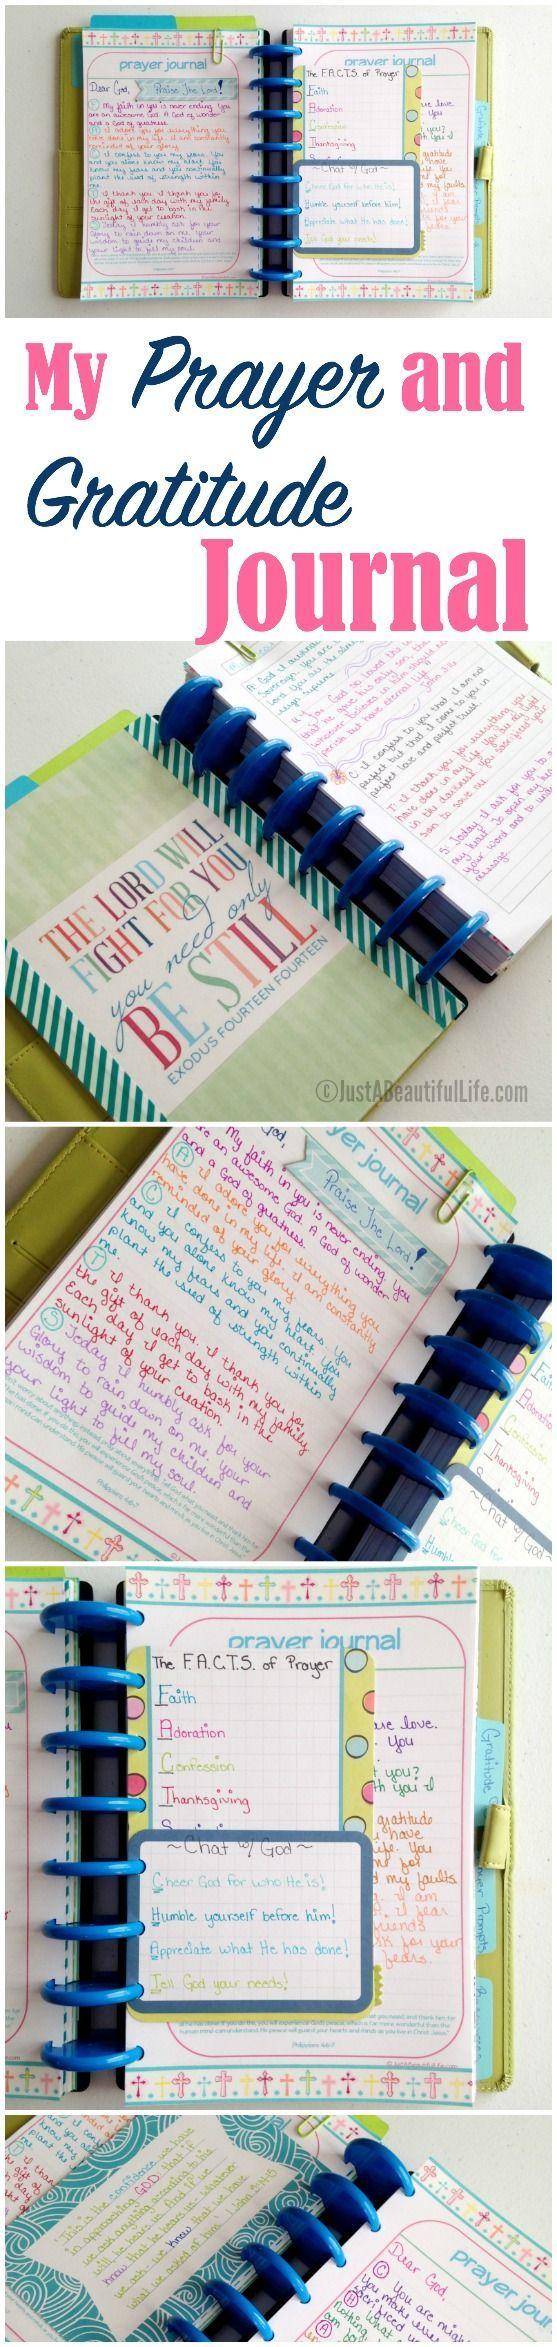 A simple set up prayer and gratitude journal.